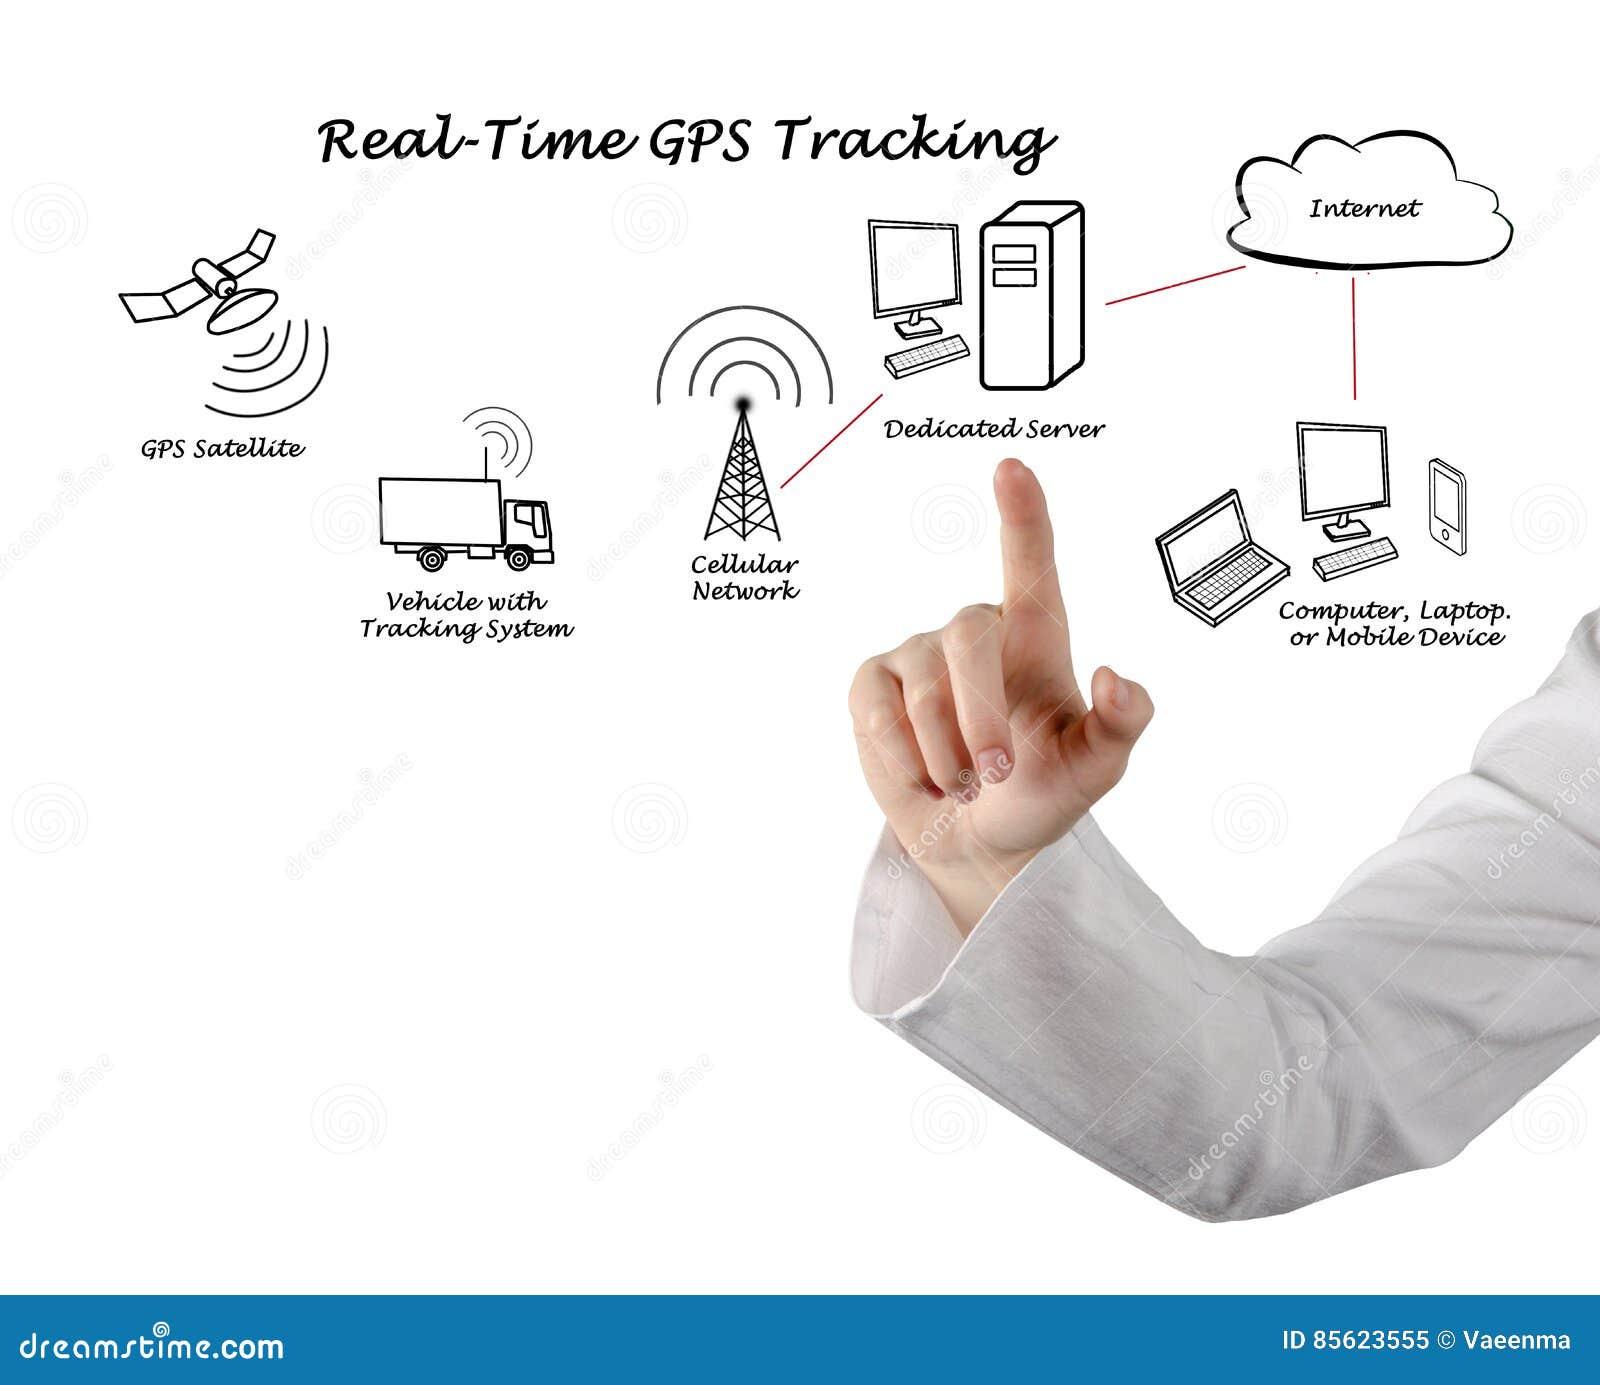 real time gps tracking stock image image of dedicated. Black Bedroom Furniture Sets. Home Design Ideas